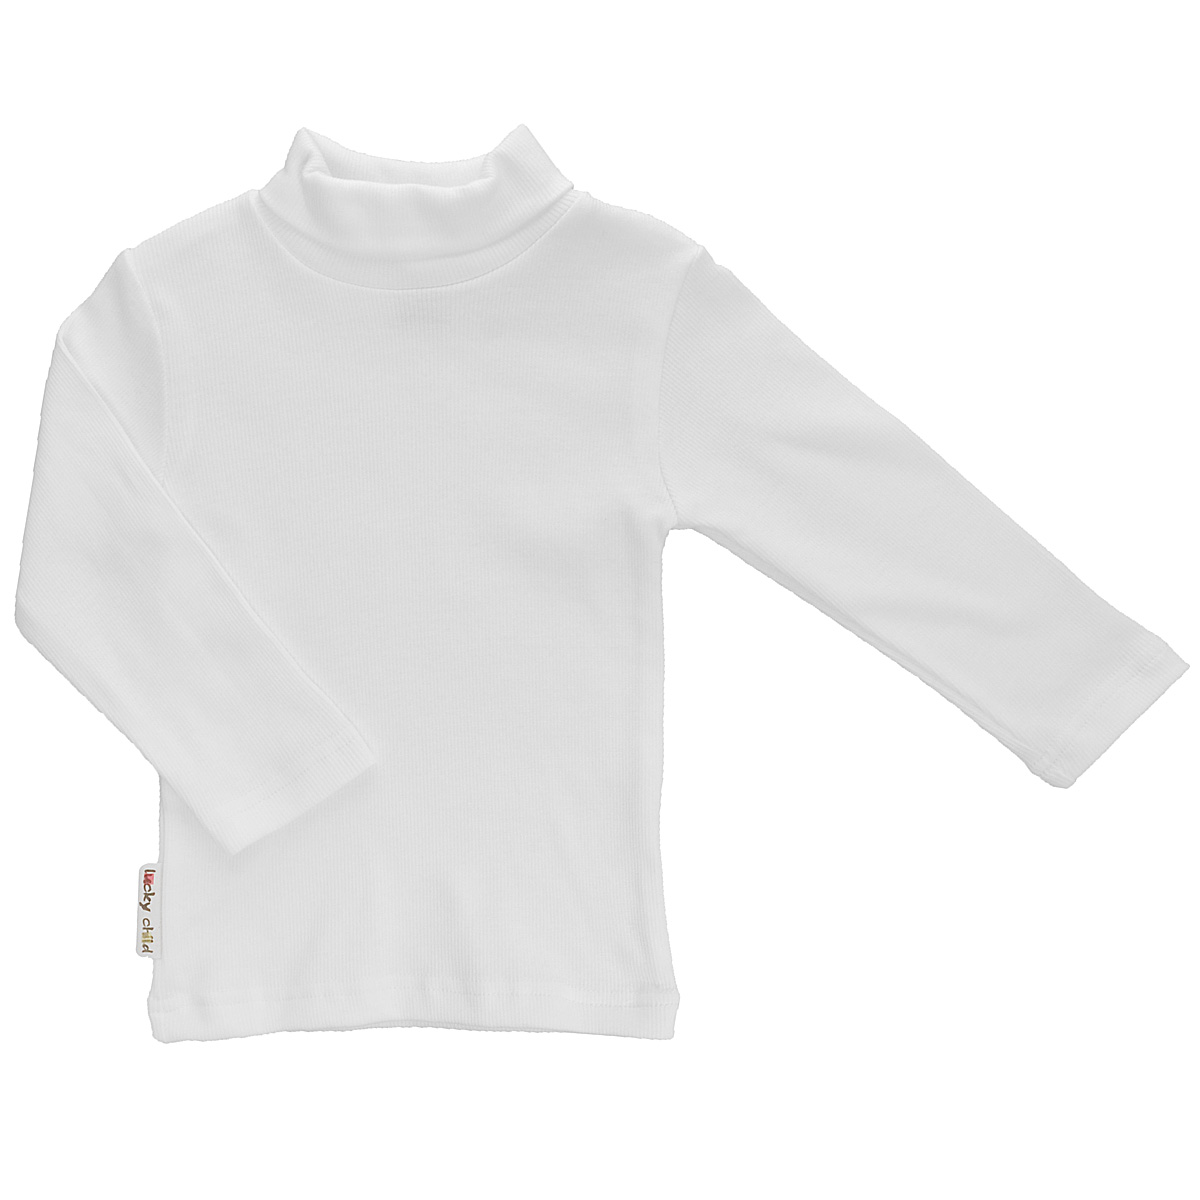 Водолазка детская Lucky Child, цвет: белый. 7-11. Размер 110/116